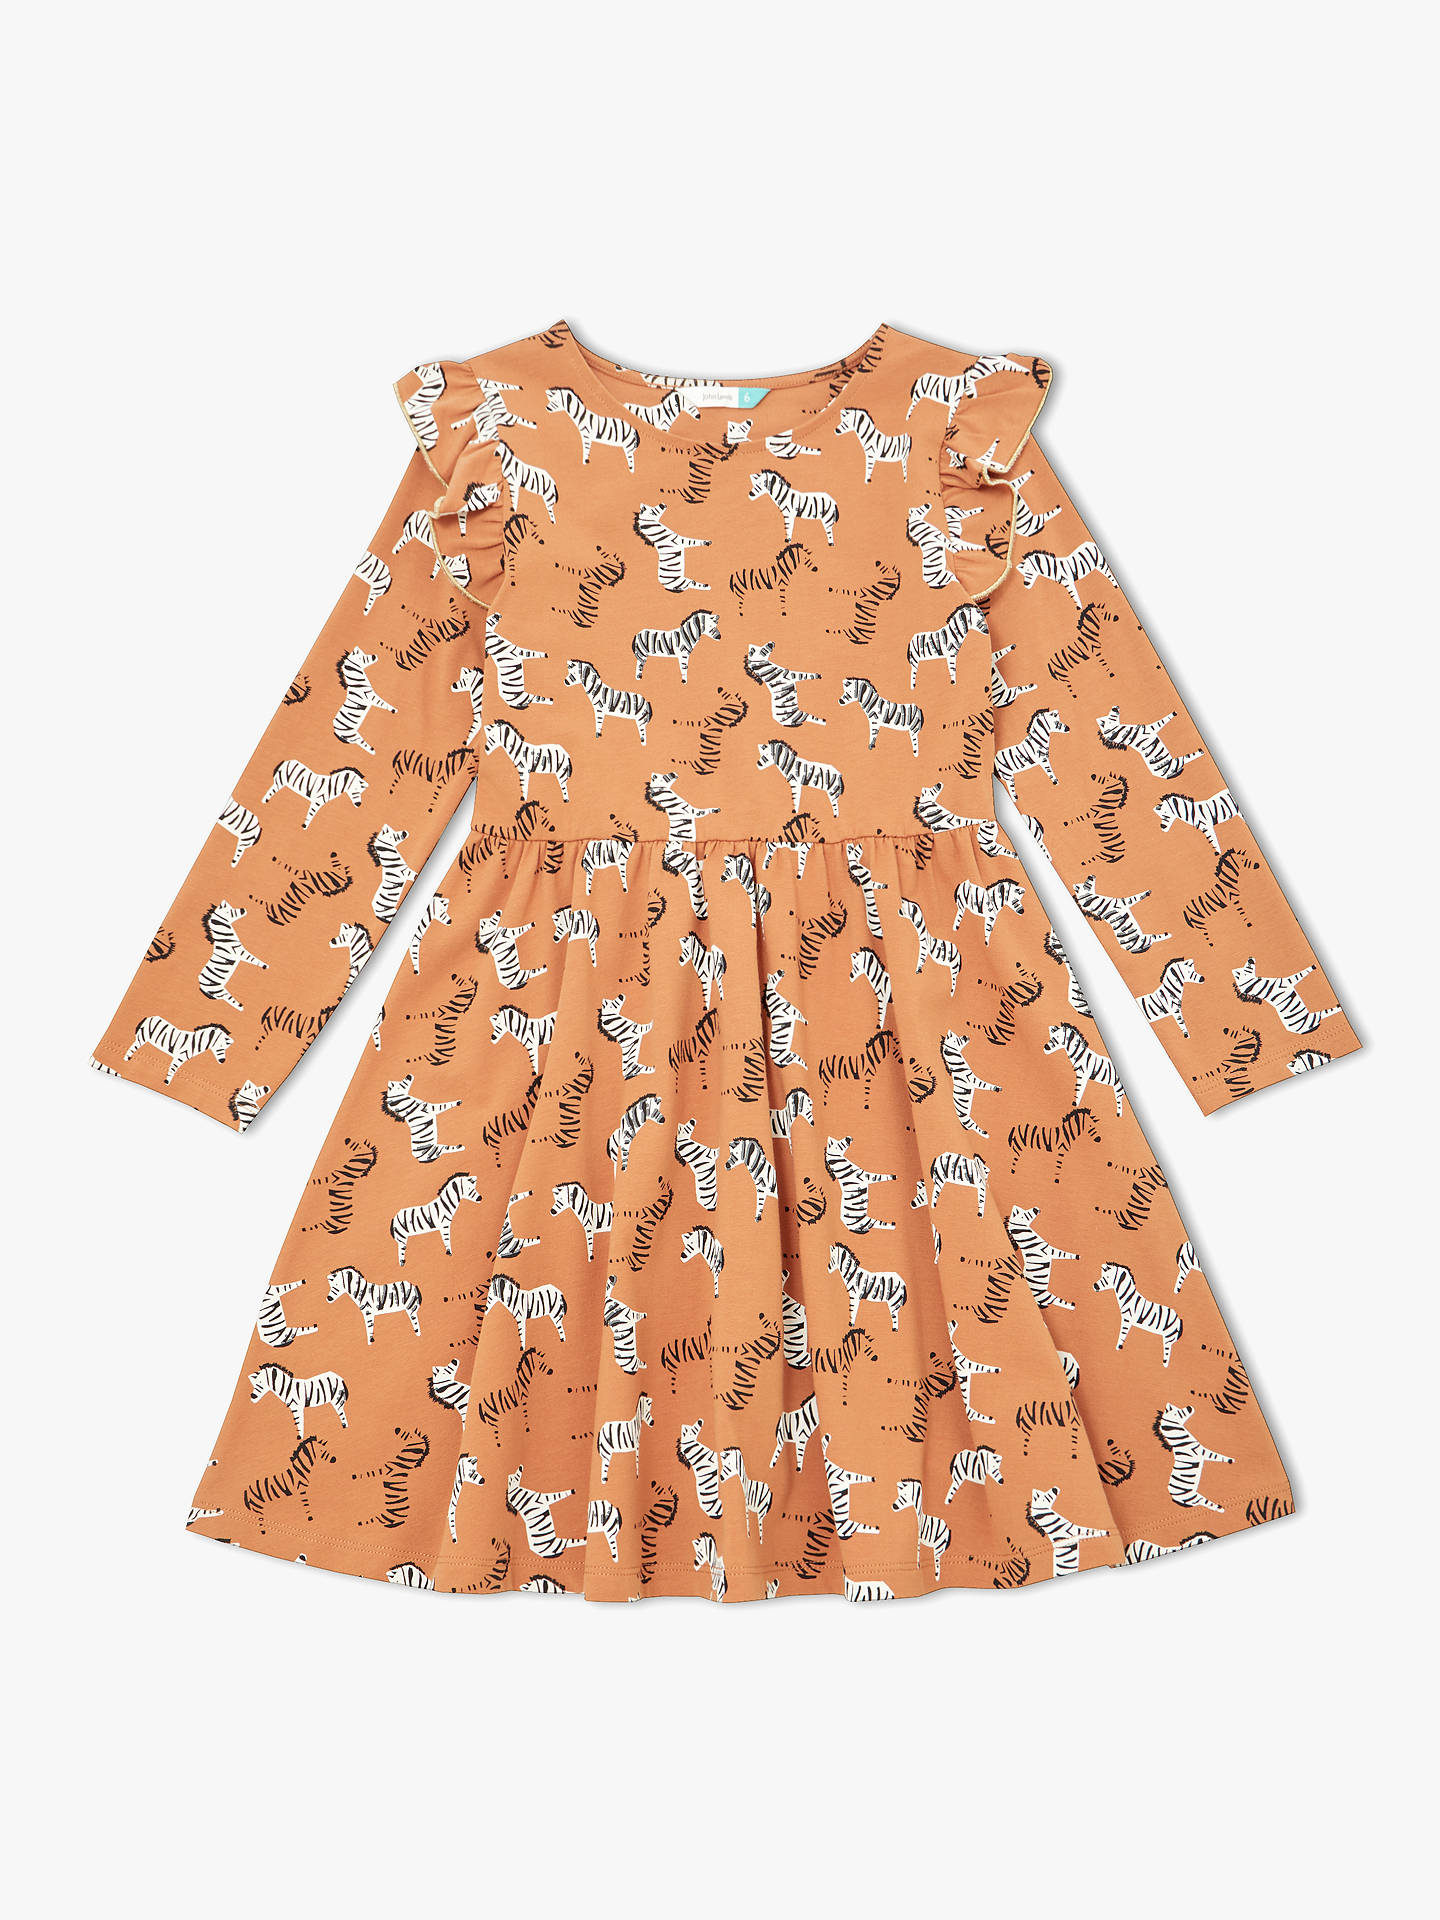 d40c46f8ee32c John Lewis & Partners Girls' Zebra Print Dress at John Lewis & Partners